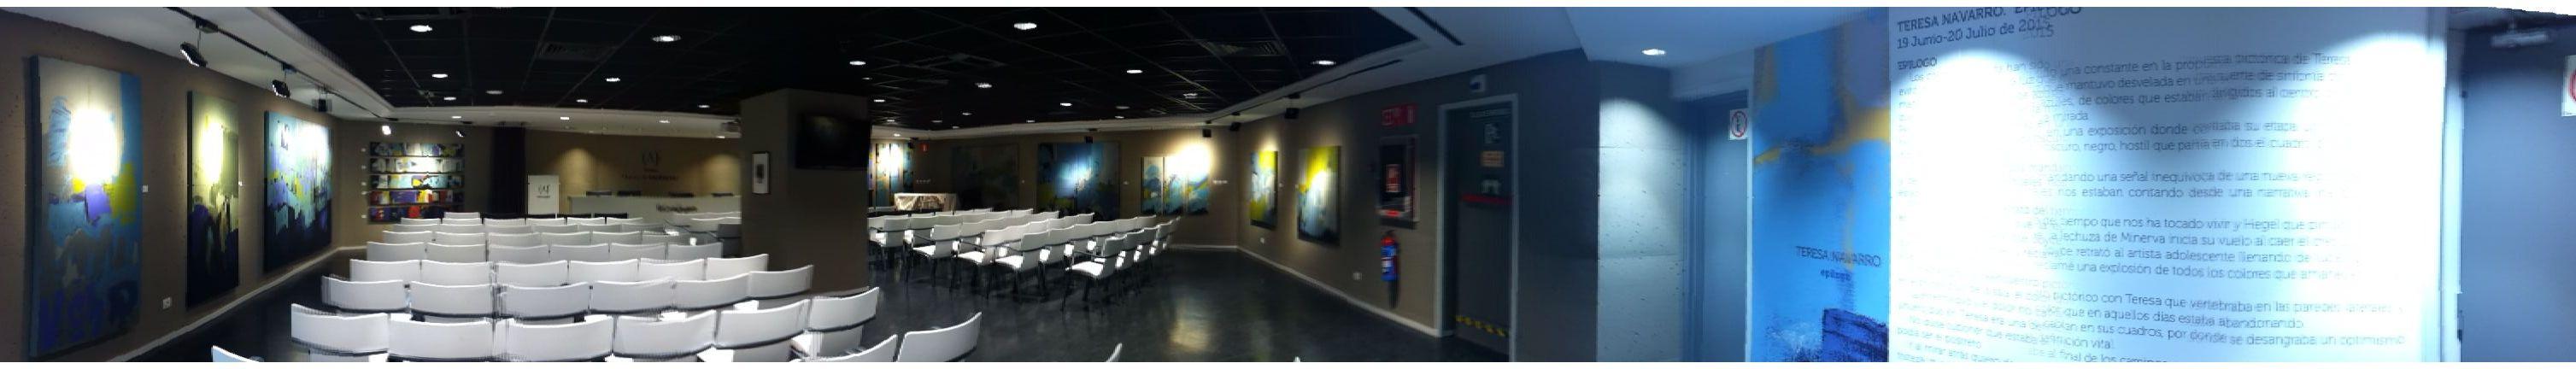 Sala Ambito Cultural Corte Ingles Angela Navarro